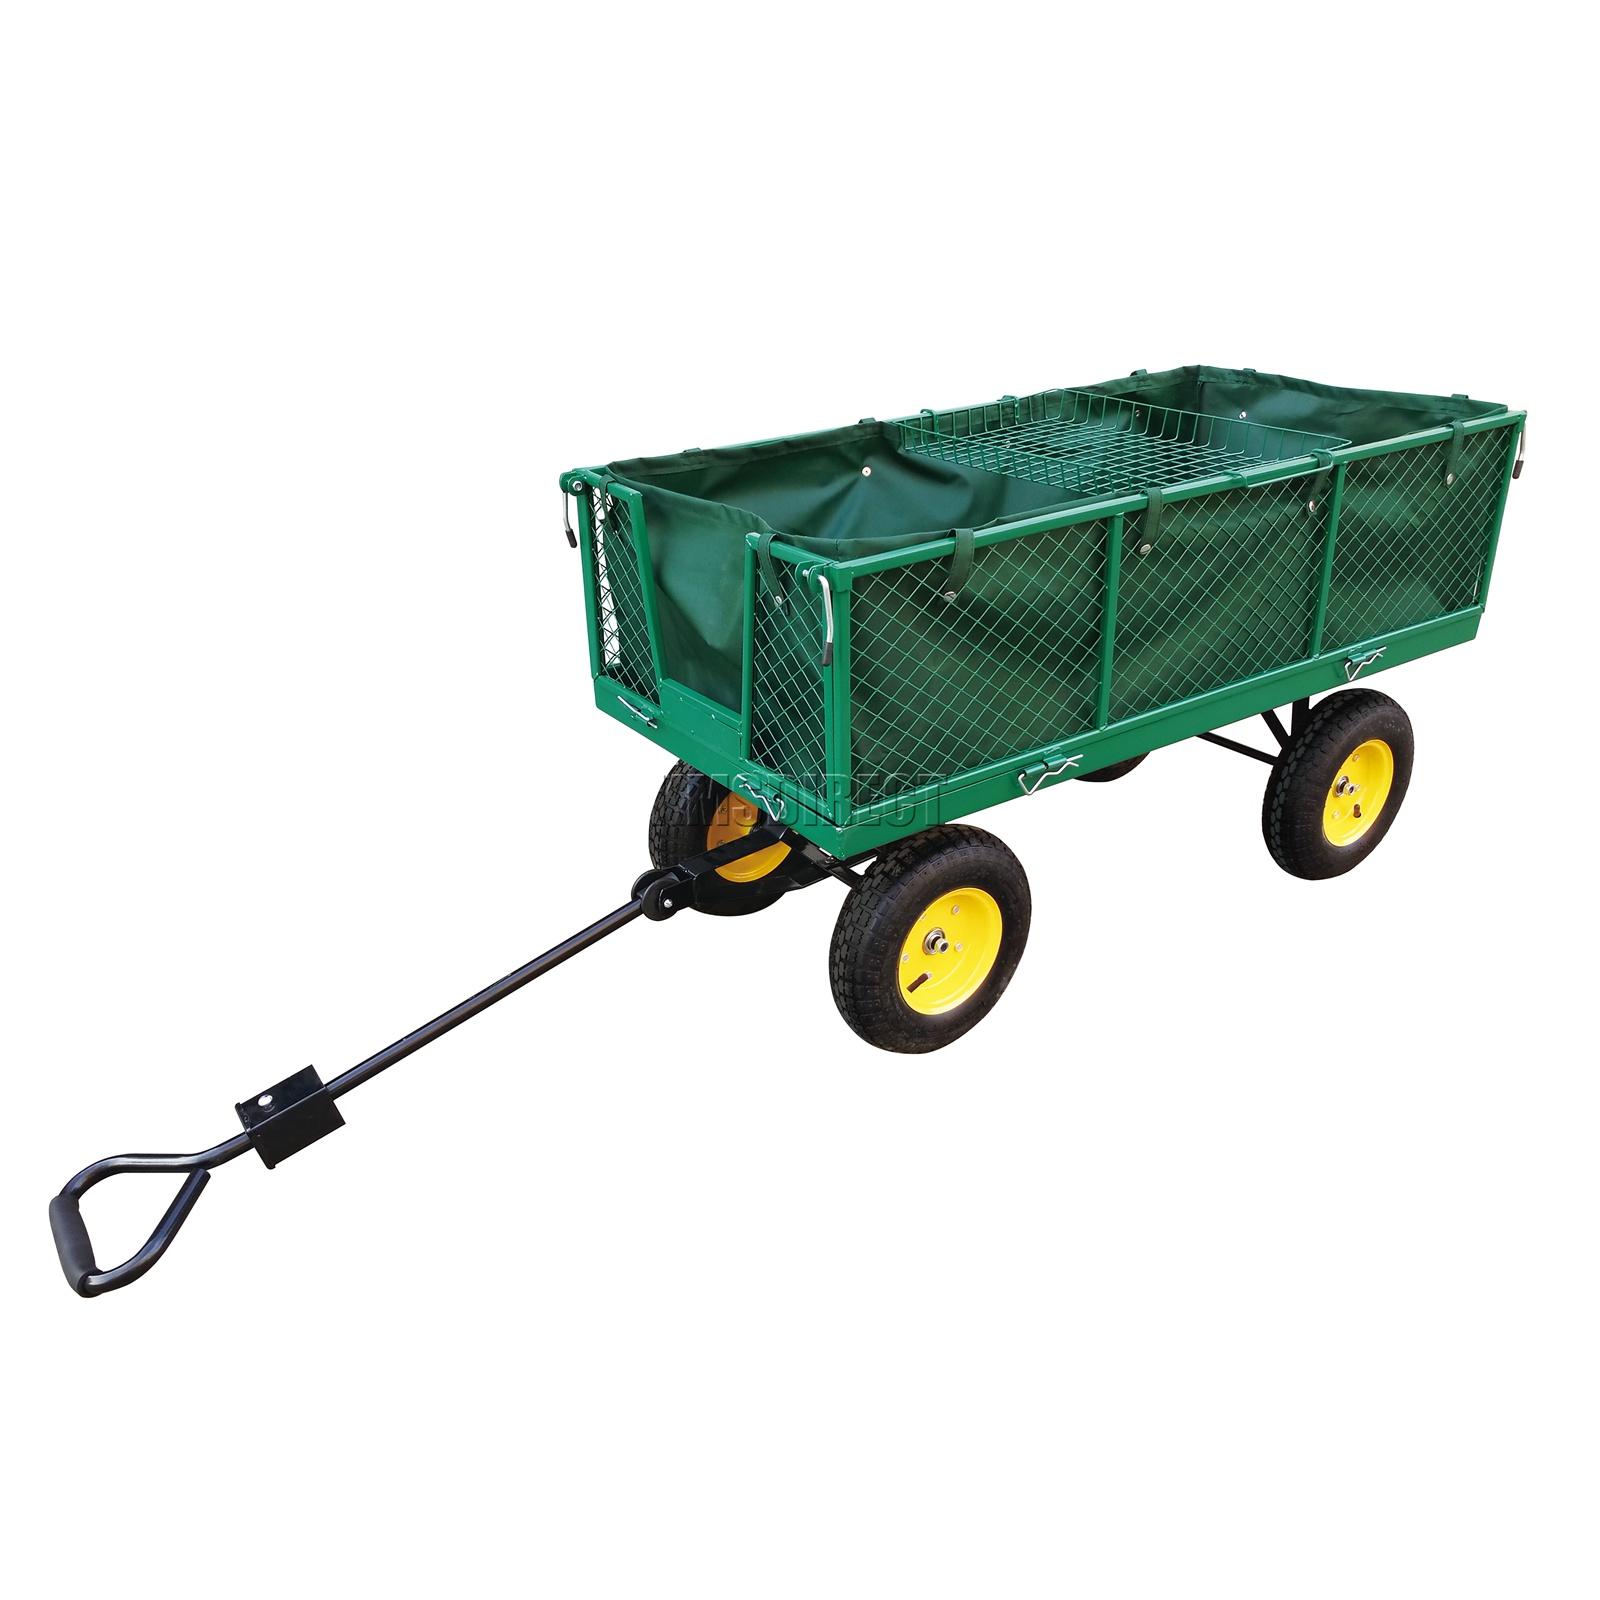 FoxHunter-Heavy-Duty-Garden-Dump-Truck-Tipping-Trailer-Trolley-Cart-Wheelbarrow miniatuur 26